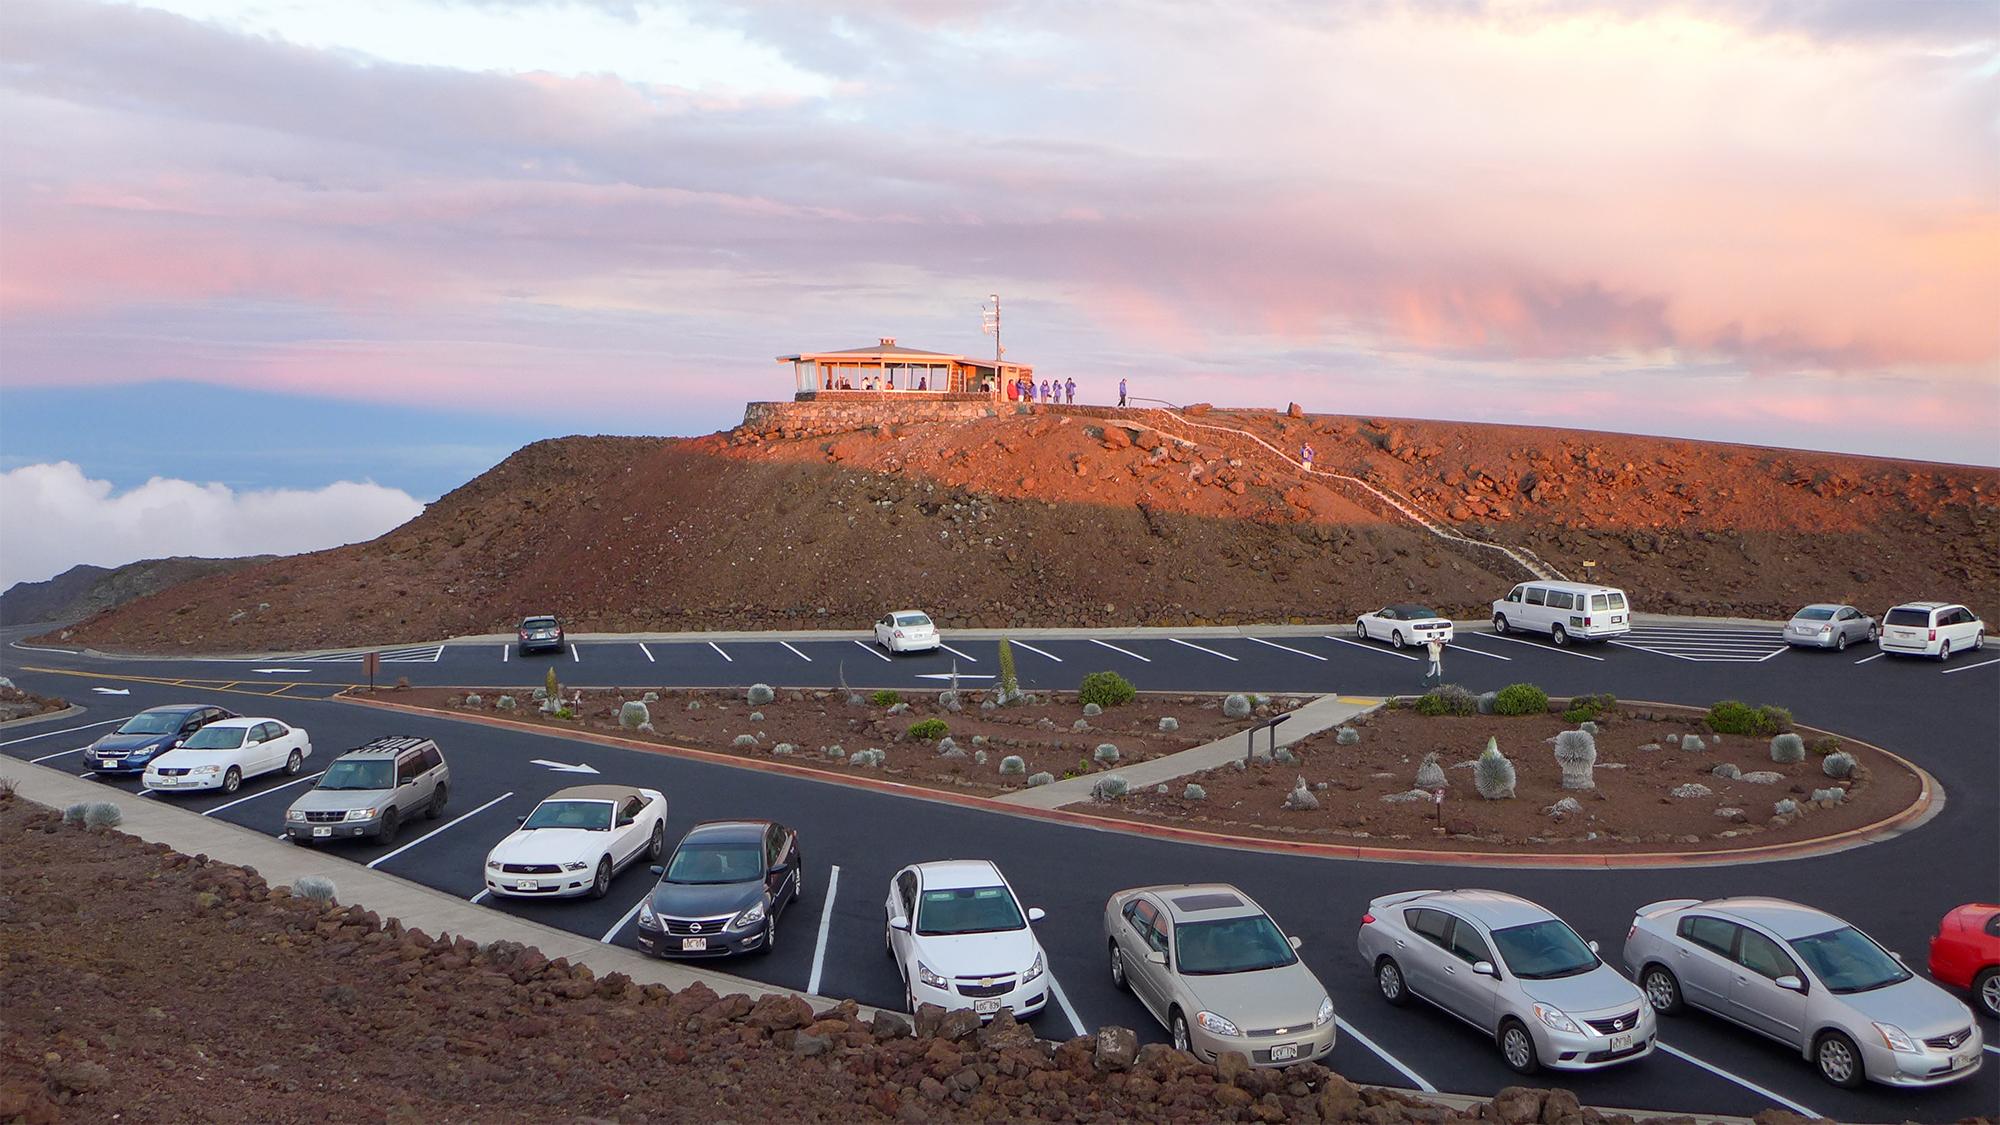 Haleakala Park Requiring Sunrise Permits Travel Weekly